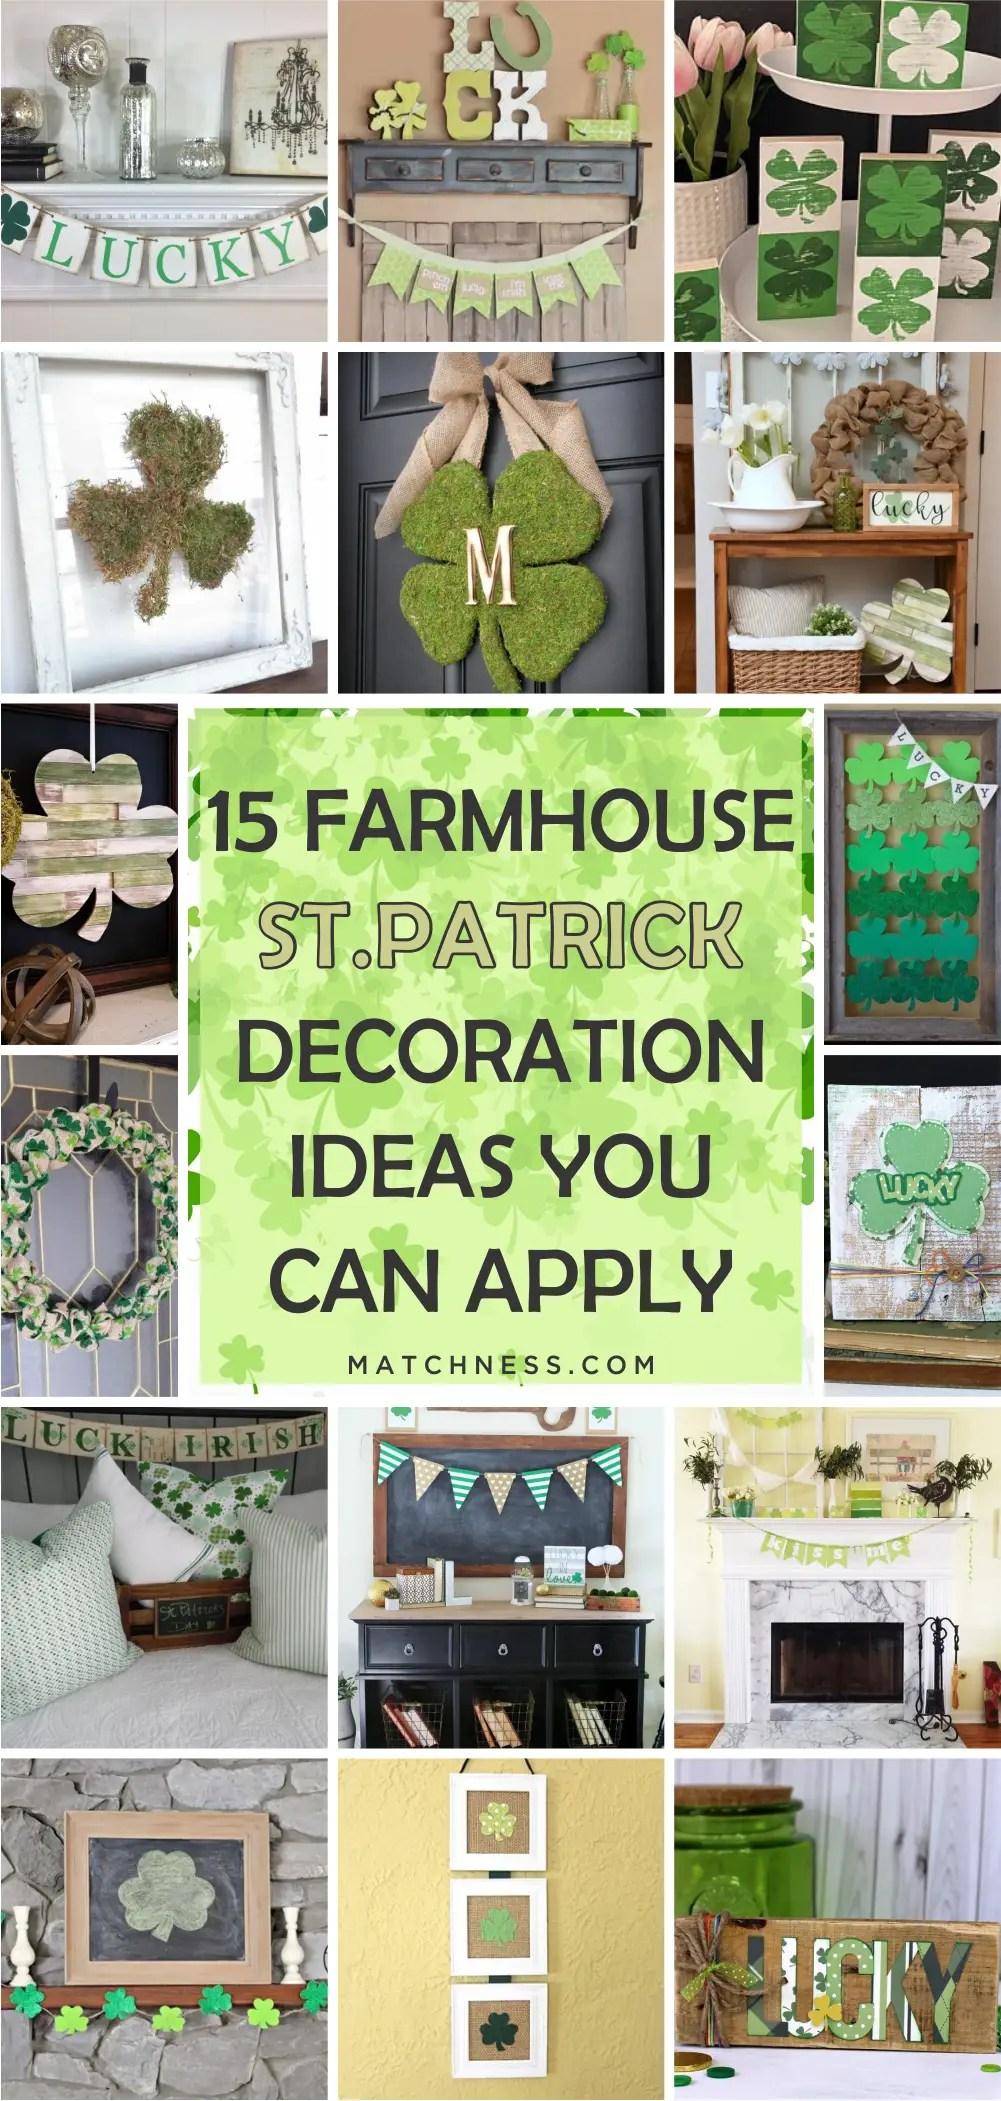 15-farmhouse-st.patrick-decoration-ideas-you-can-apply-1